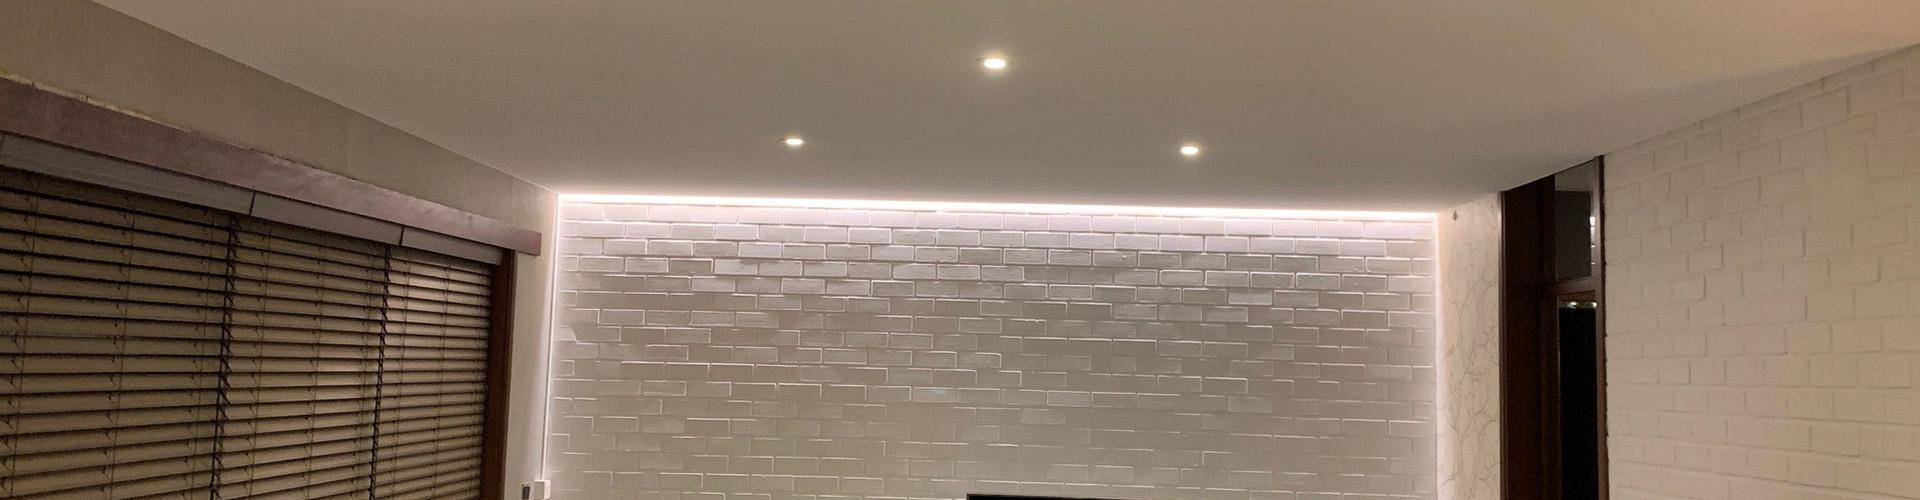 spanplafond03